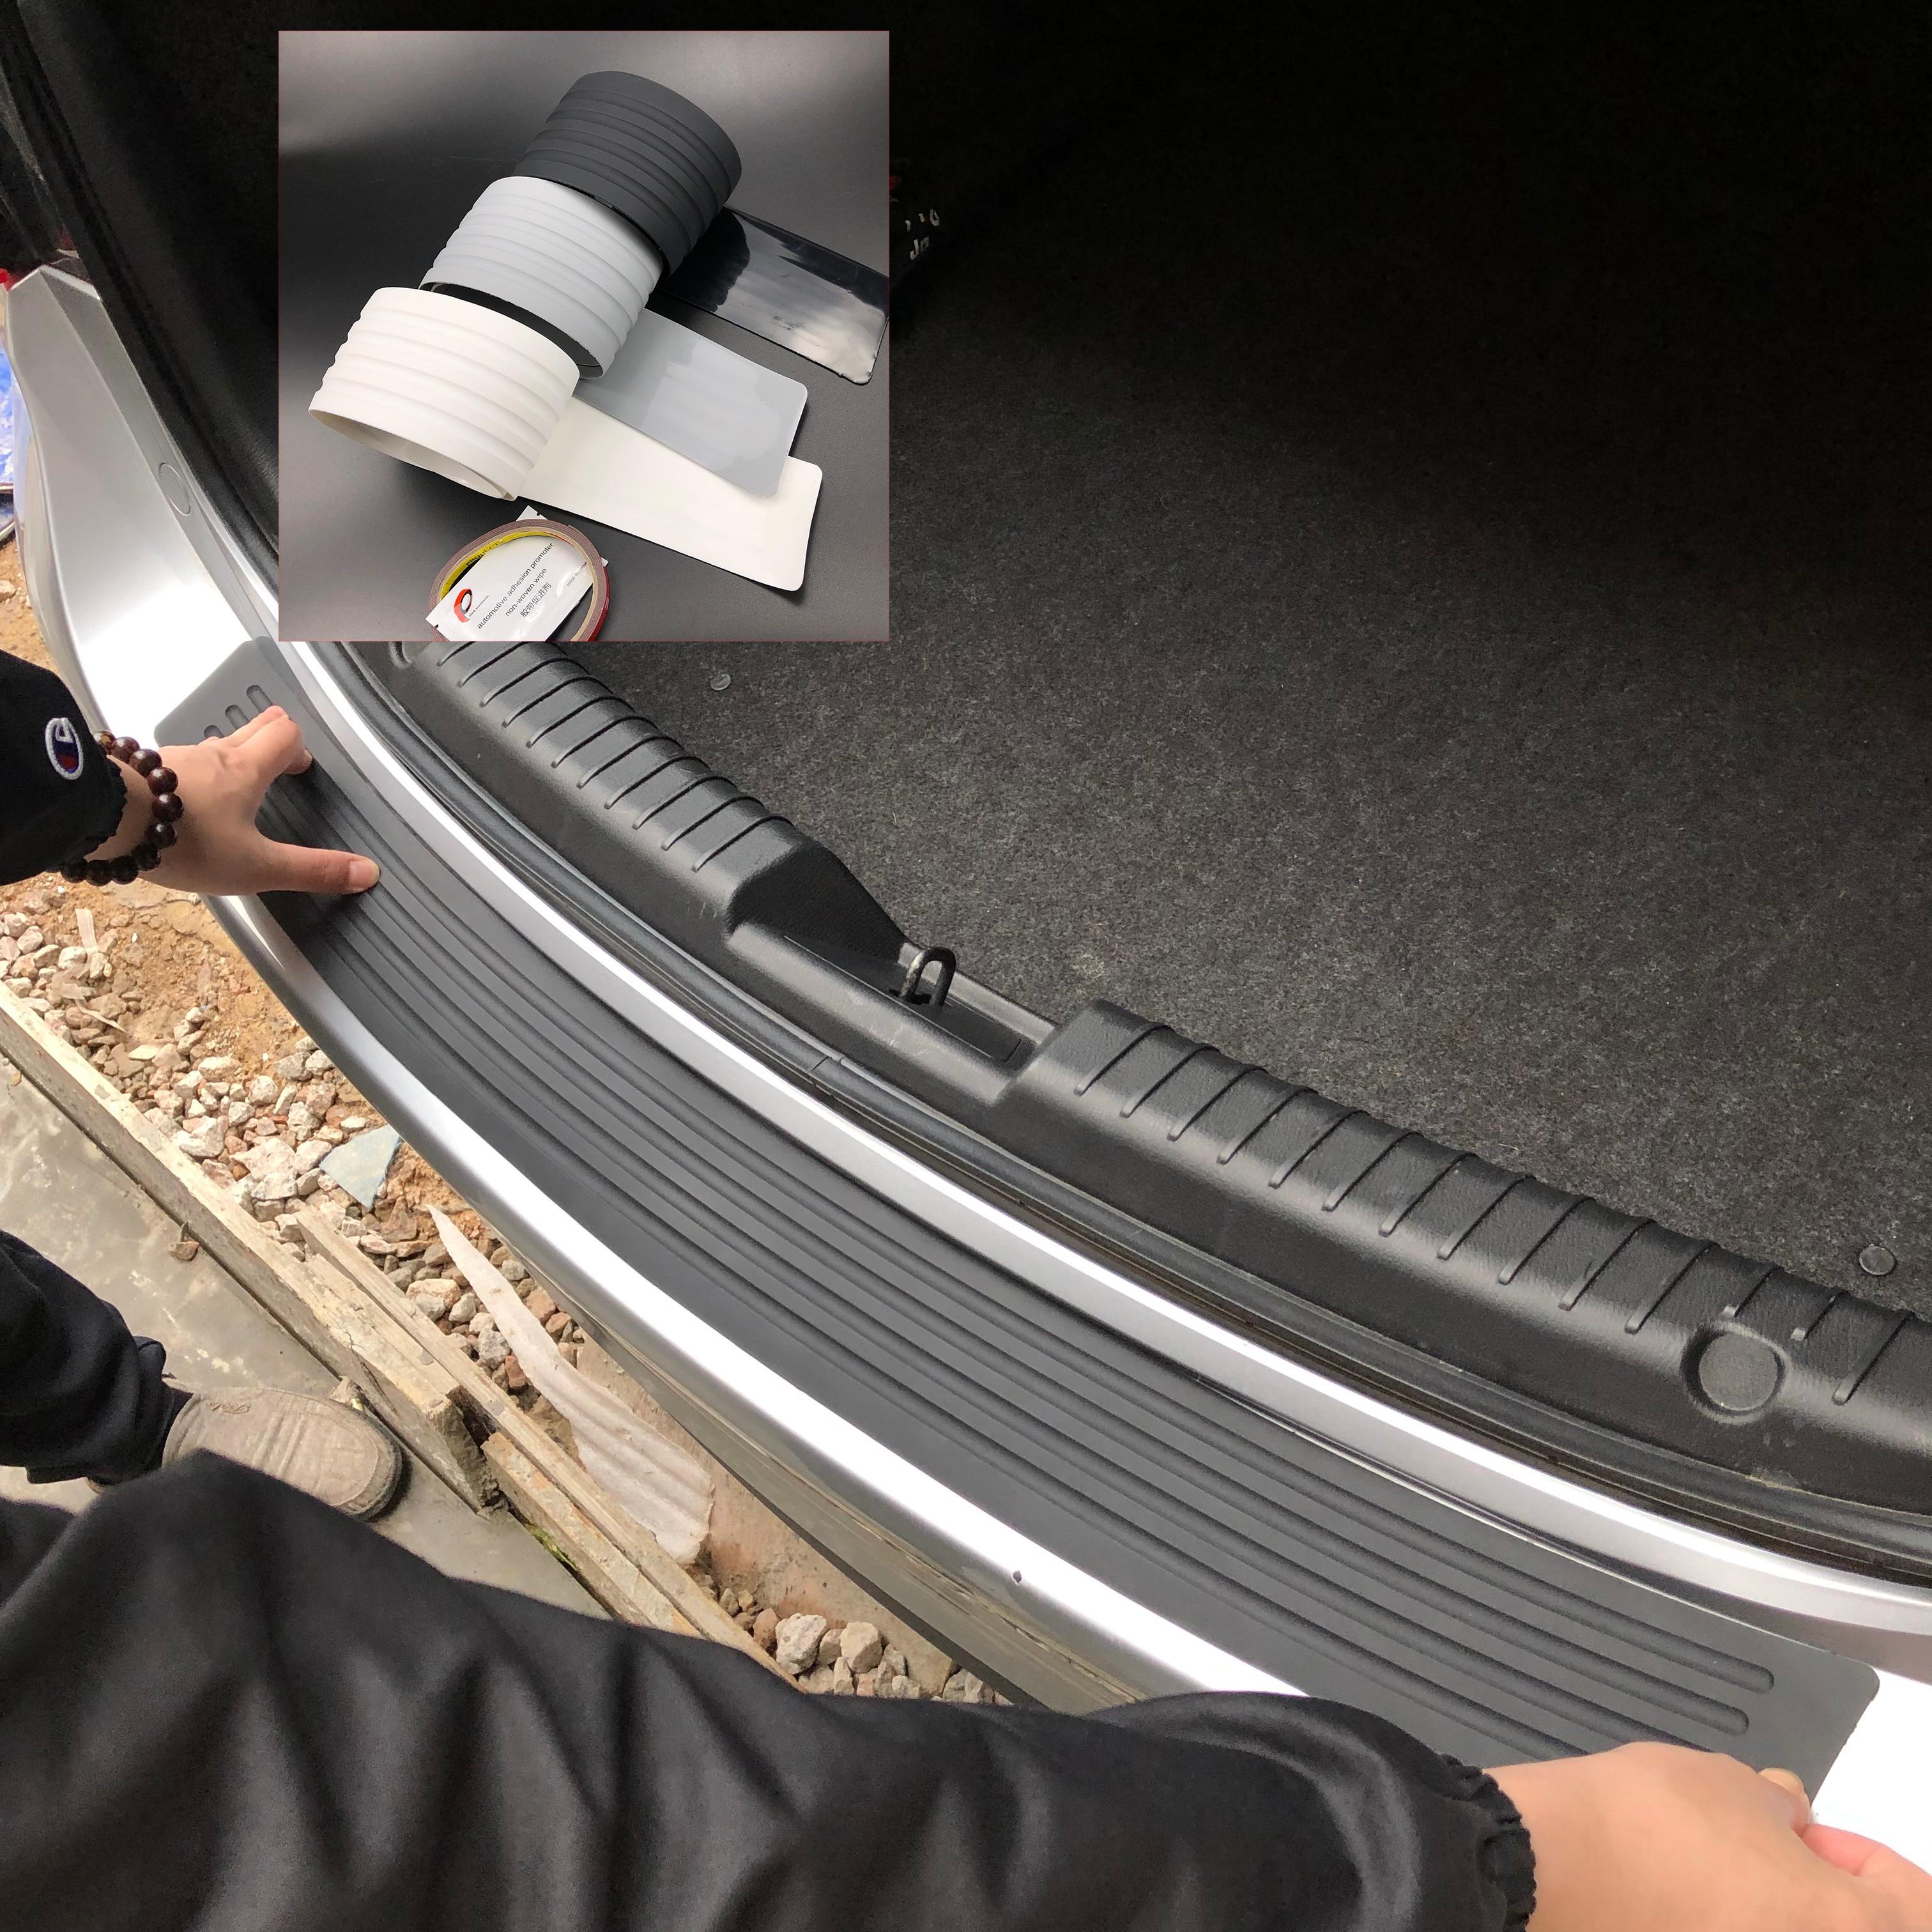 Cubierta protectora de desgaste de parachoques trasero de coche para Hyundai SantaFe Veracruz Mistra Tucson Veloster Rohens AZERA Avante IONIQ